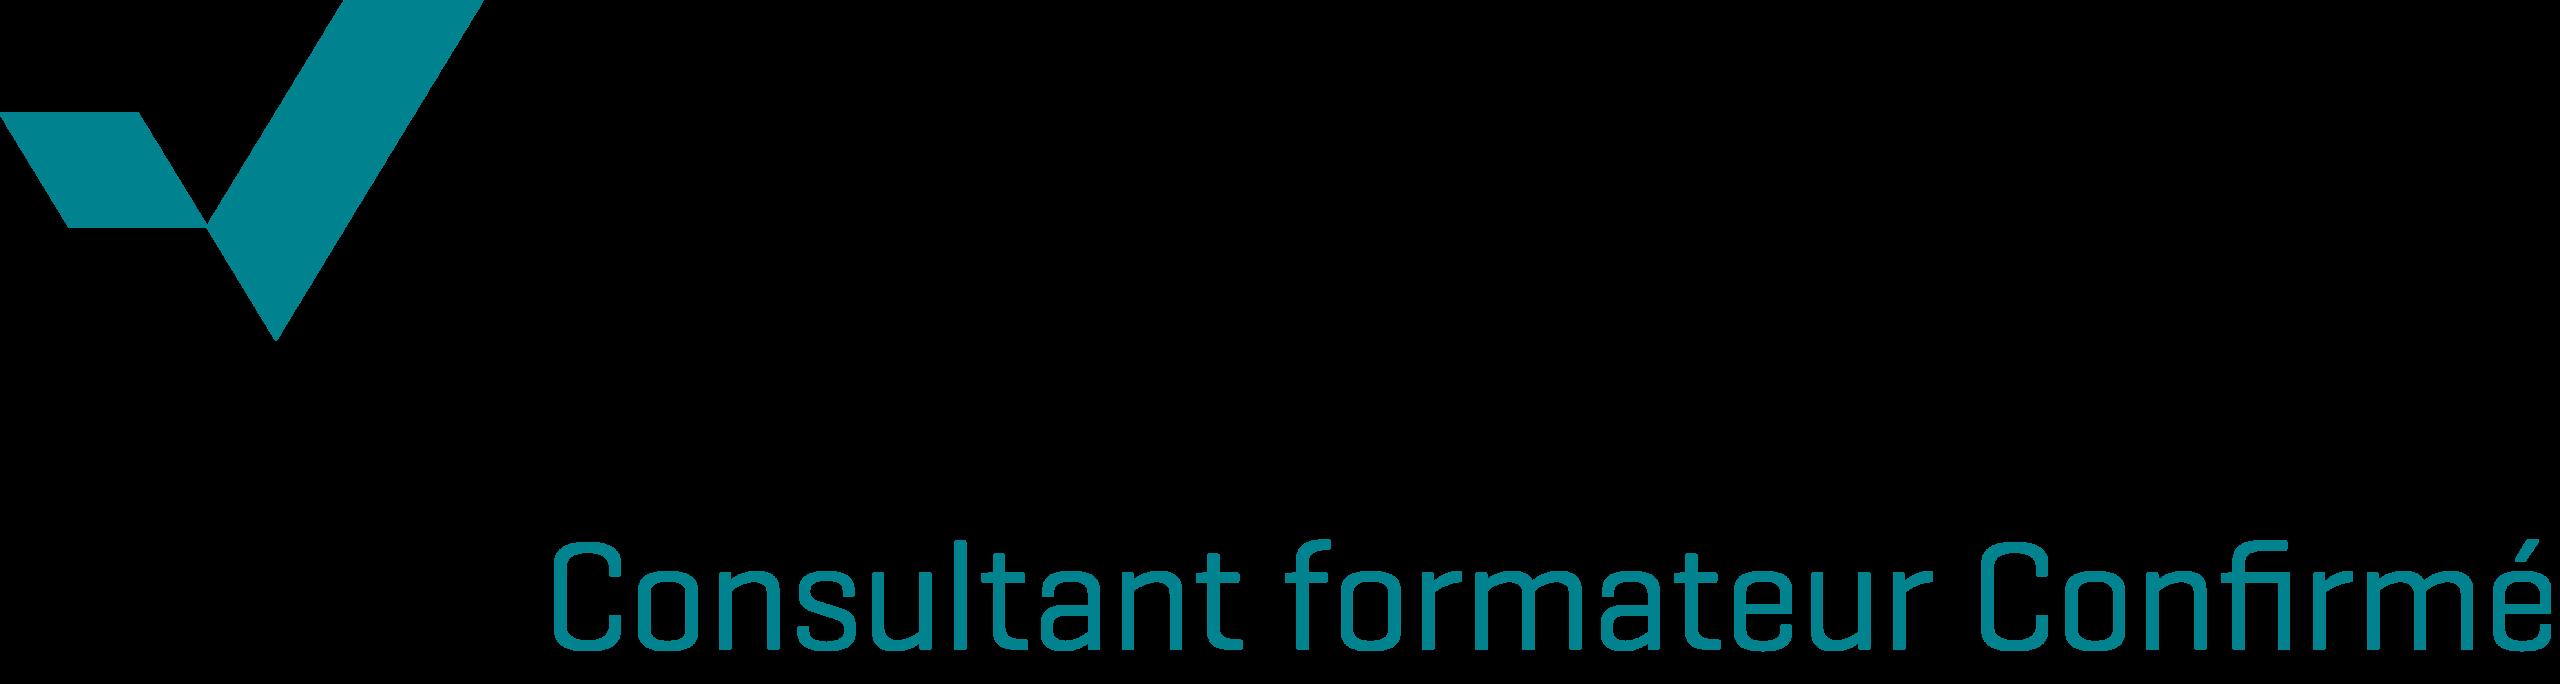 Logo ICPF Certification PRO Consultant Formateur Confirmé